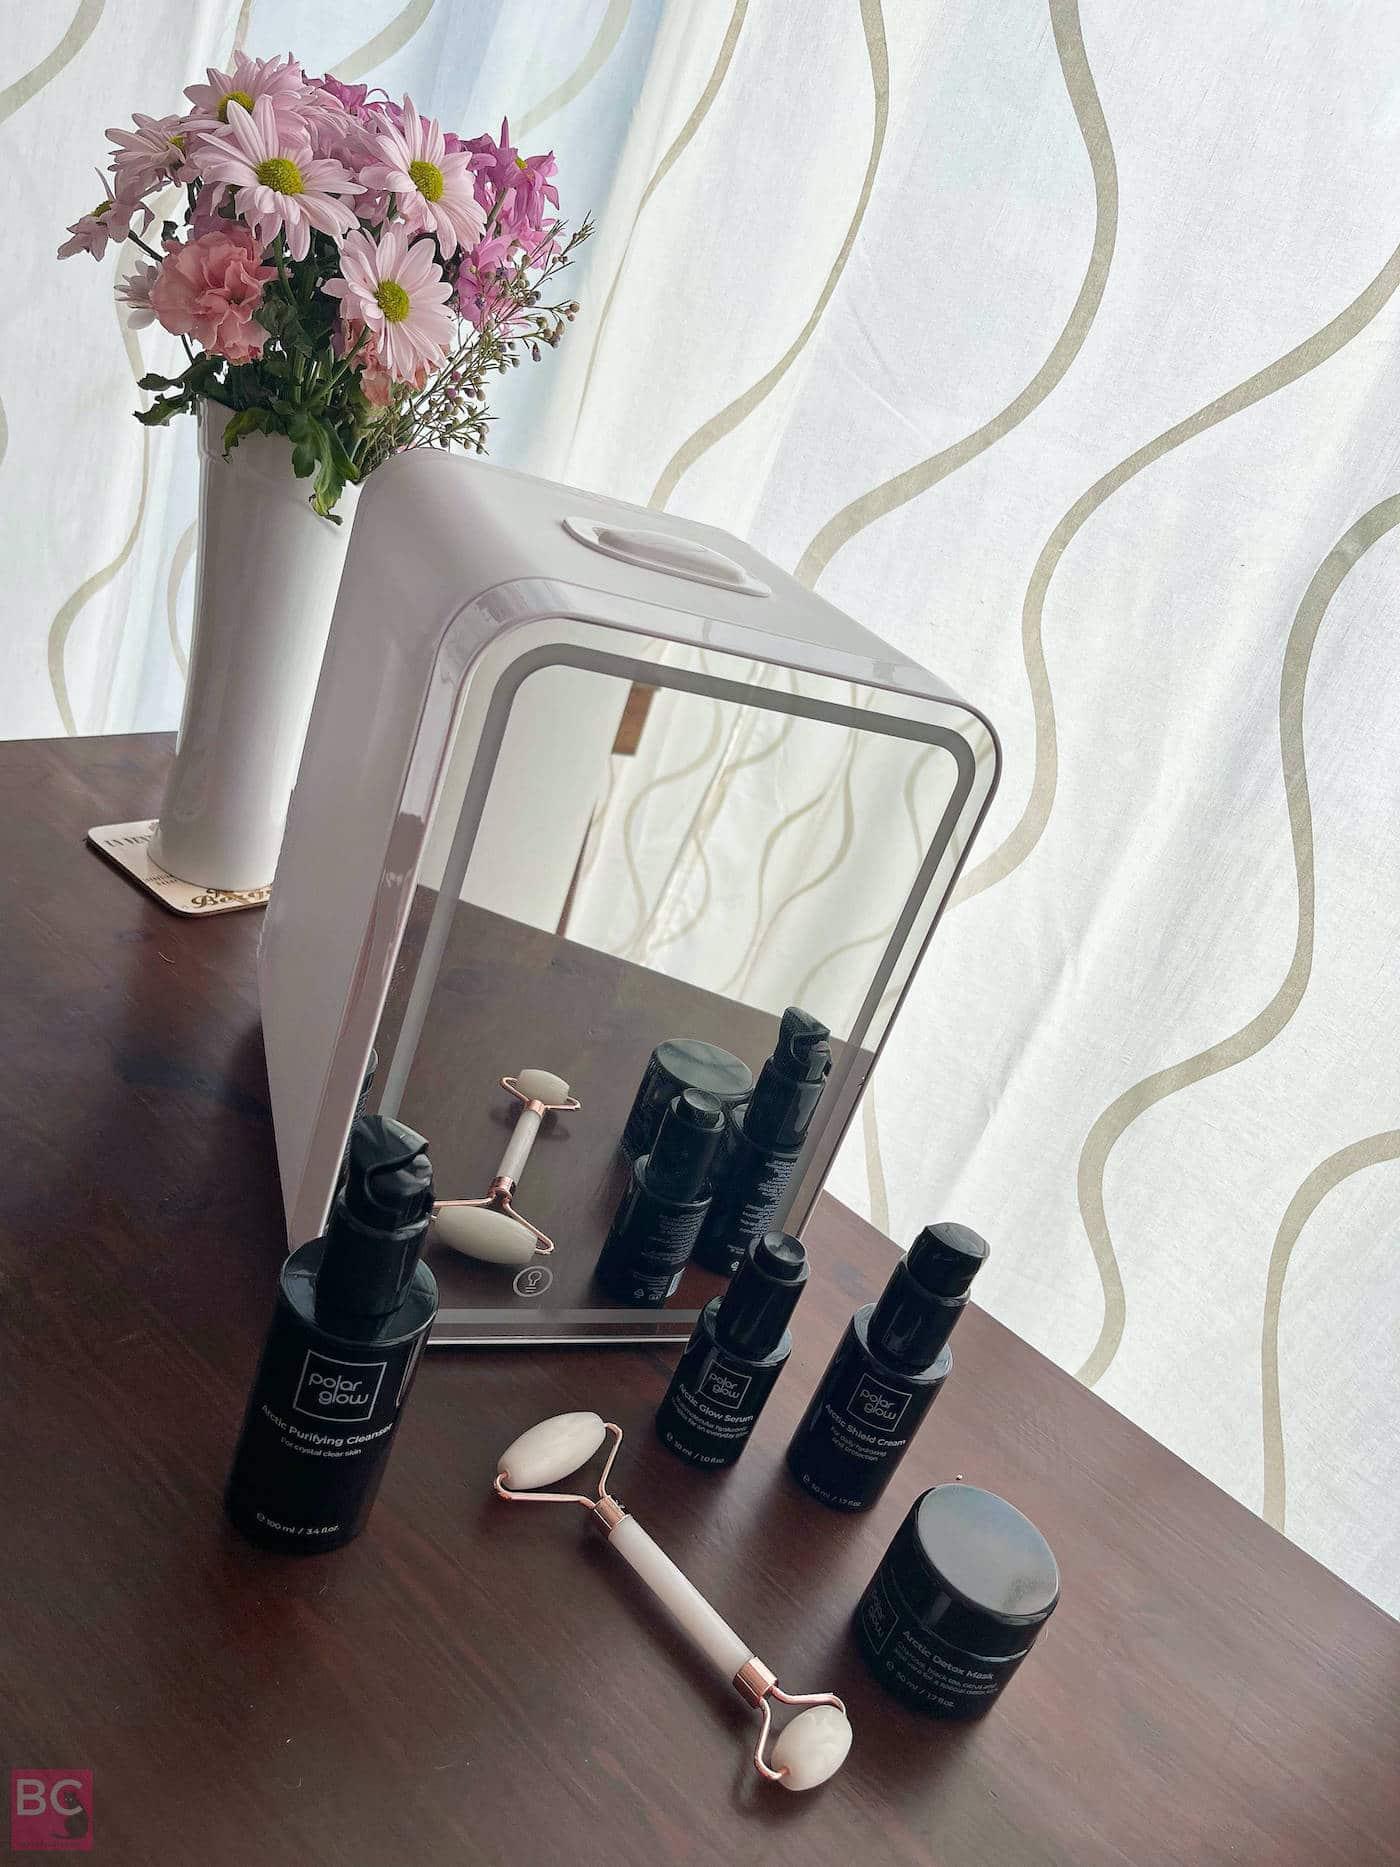 POLARGLOW GLOWBOX BOX Kühlschrank Arctic Skincare Linie Beauty Roller